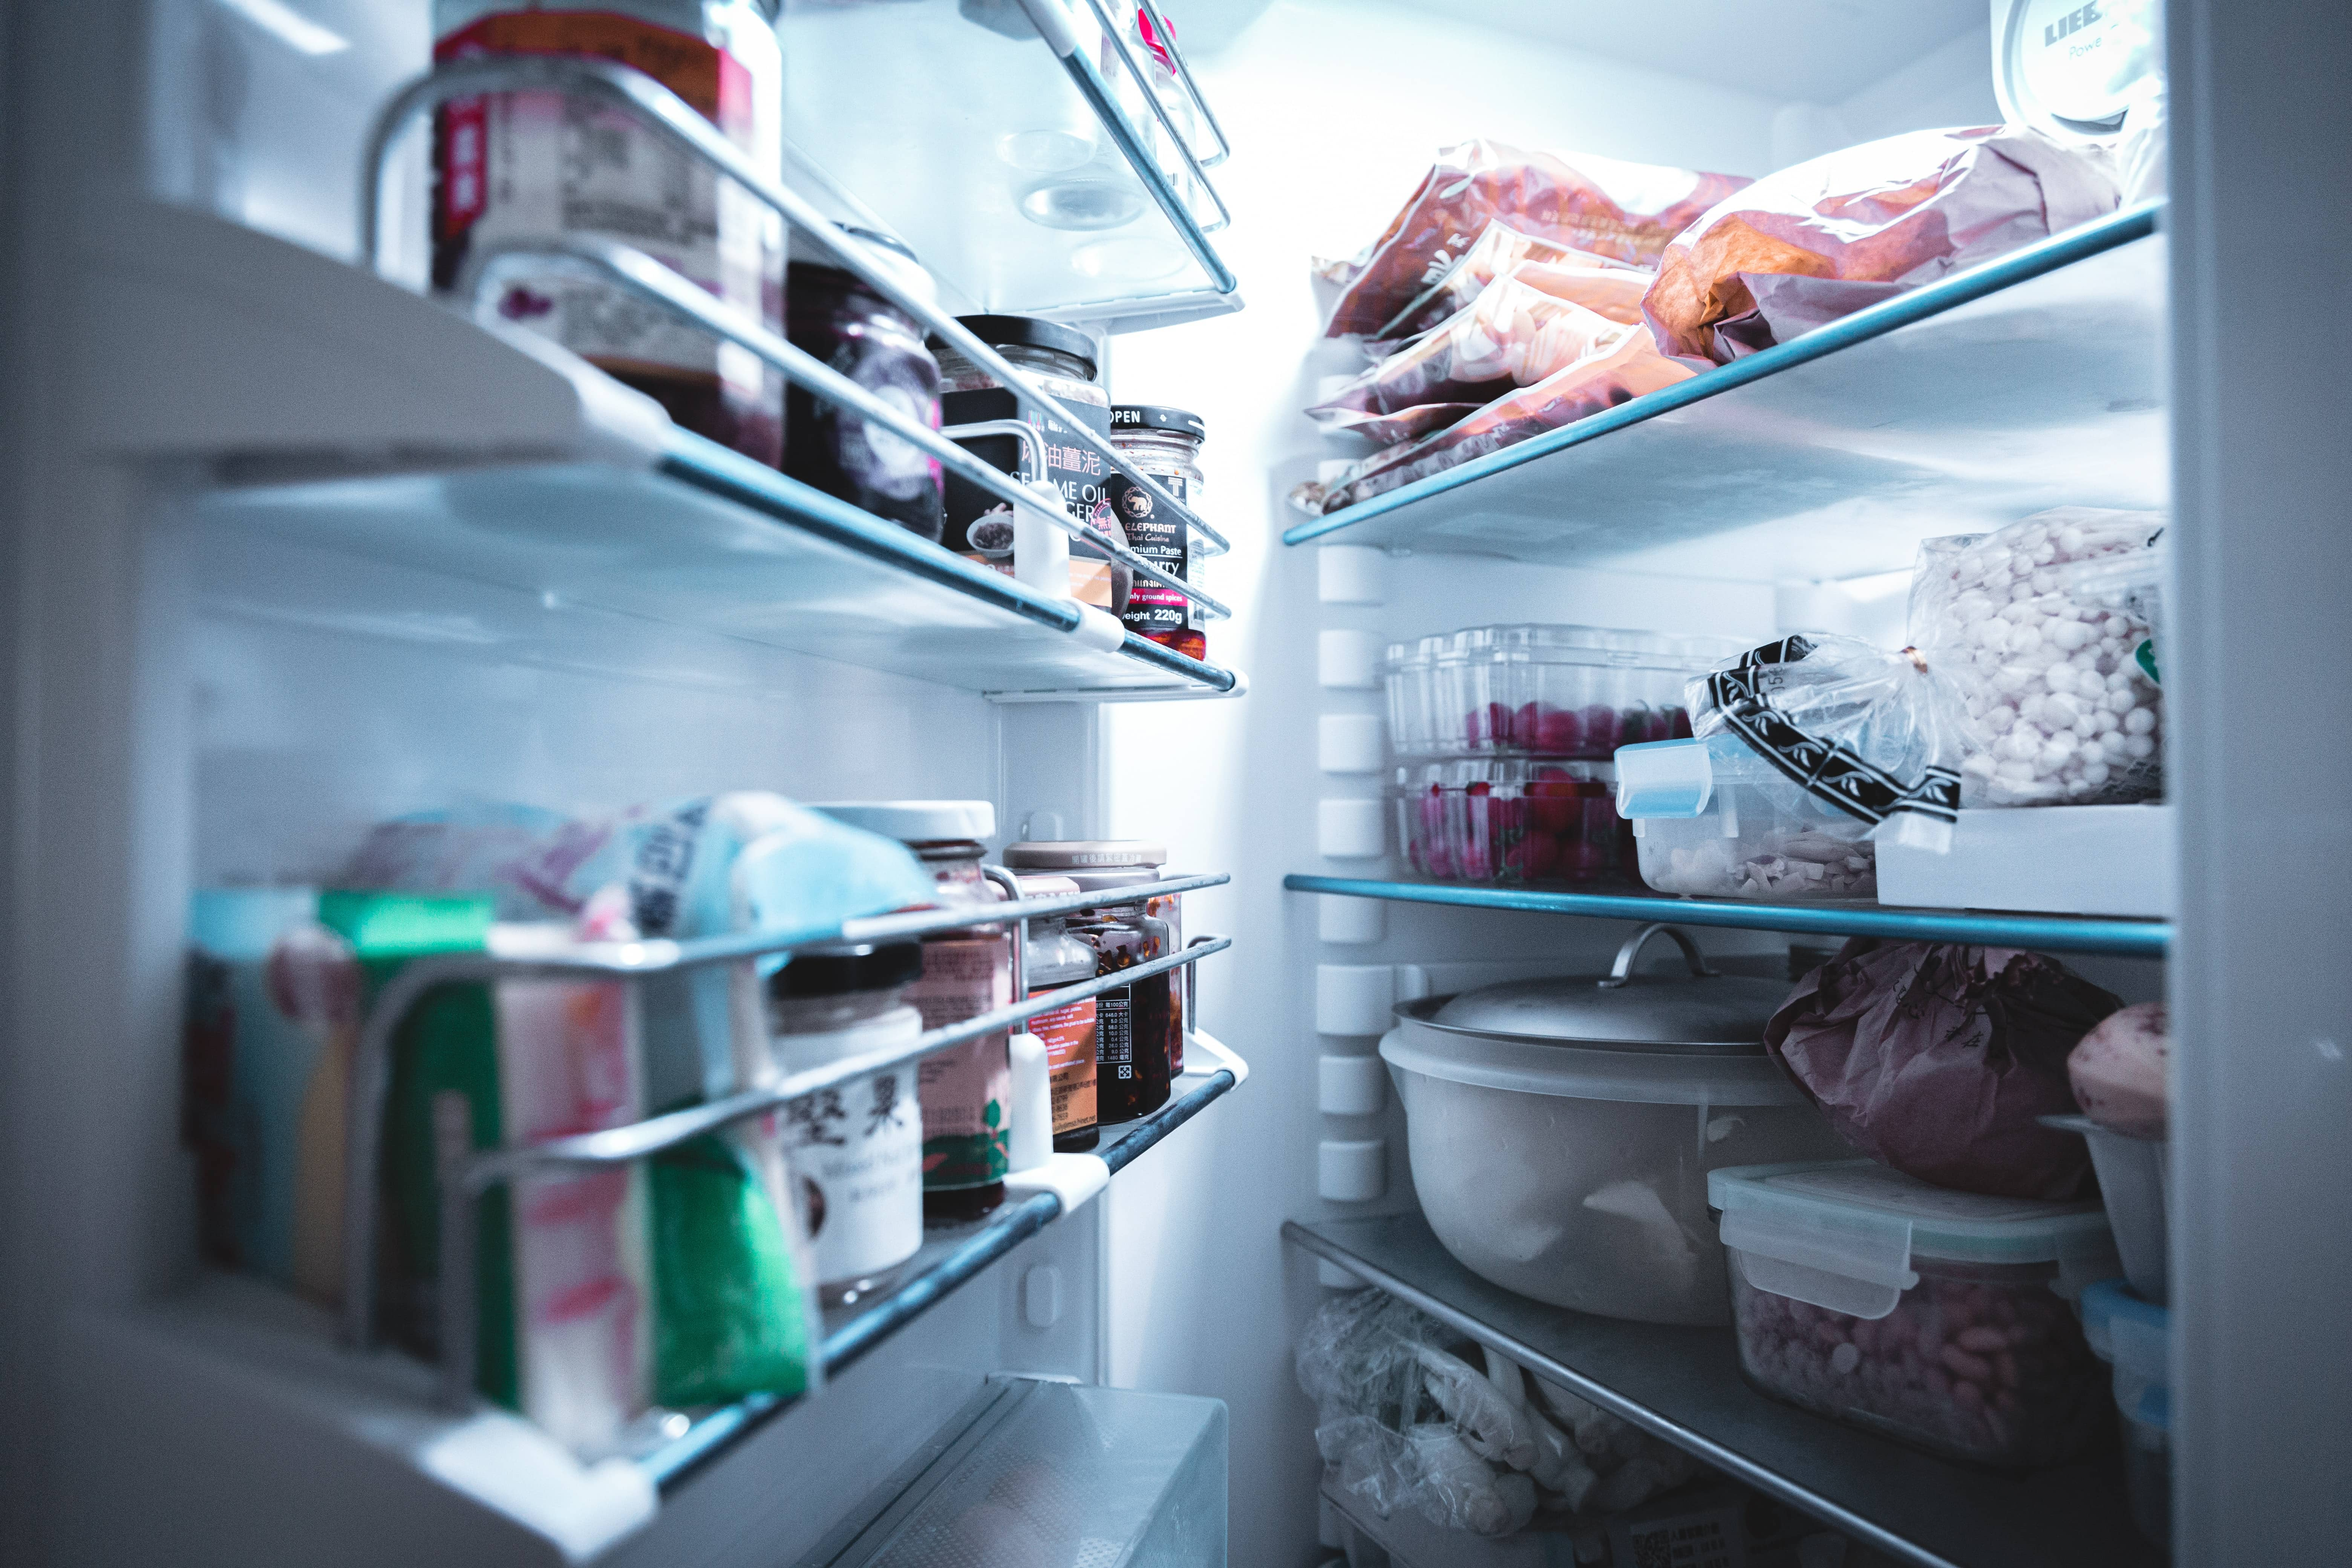 Fridge Spares For Your Freezers And Refridgerators